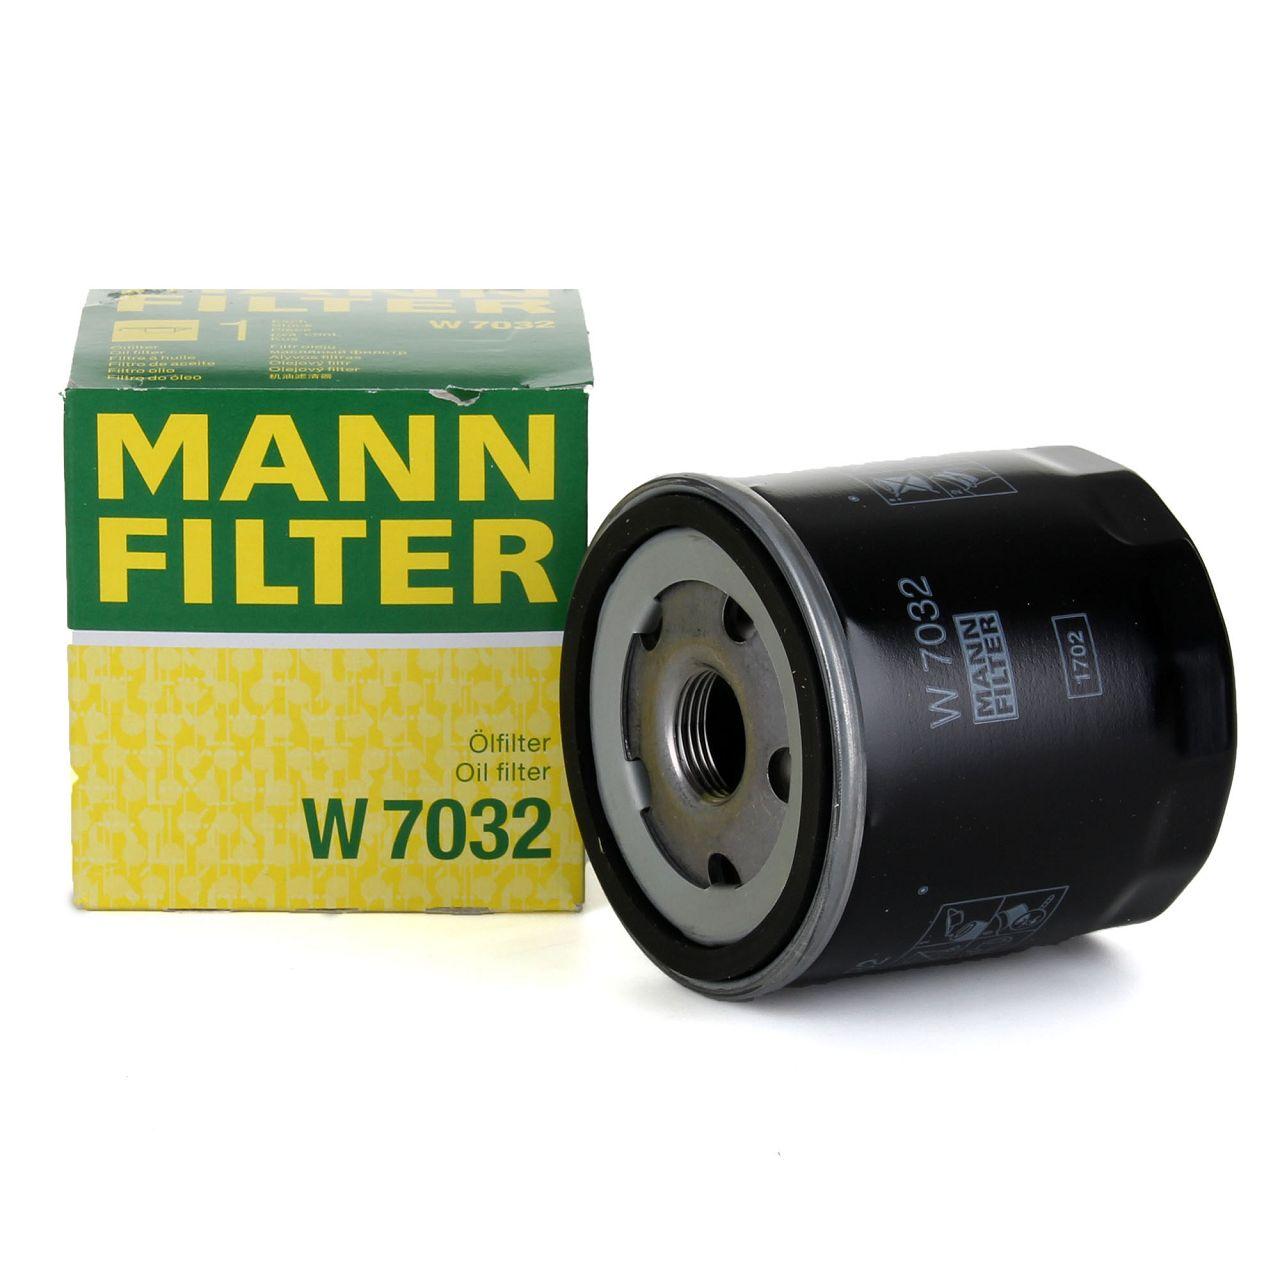 MANN Ölfilter W7032 für DACIA INFINITI MERCEDES-BENZ NISSAN RENAULT